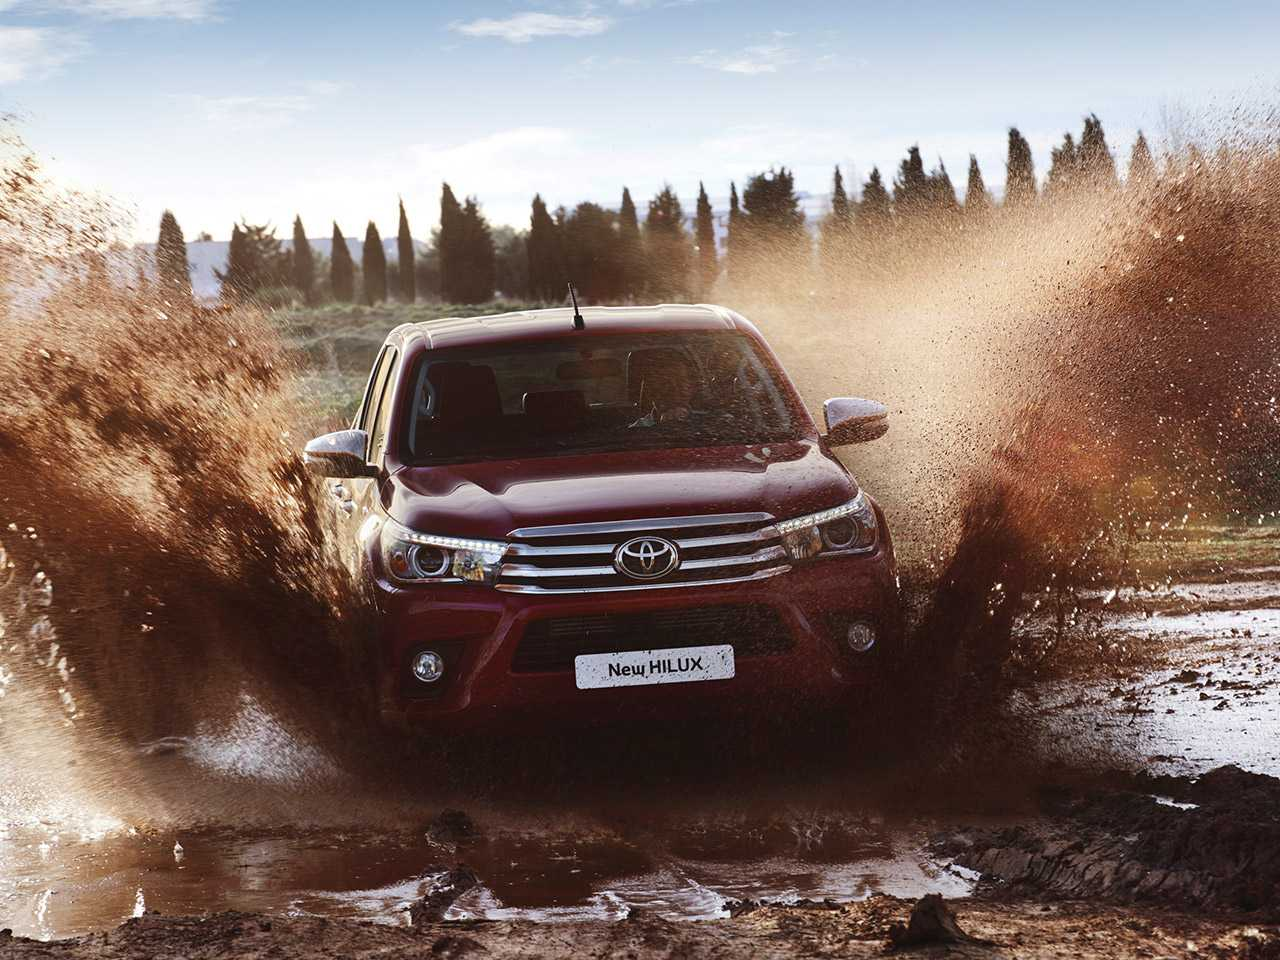 Detalhe da Toyota Hilux vendida na Europa